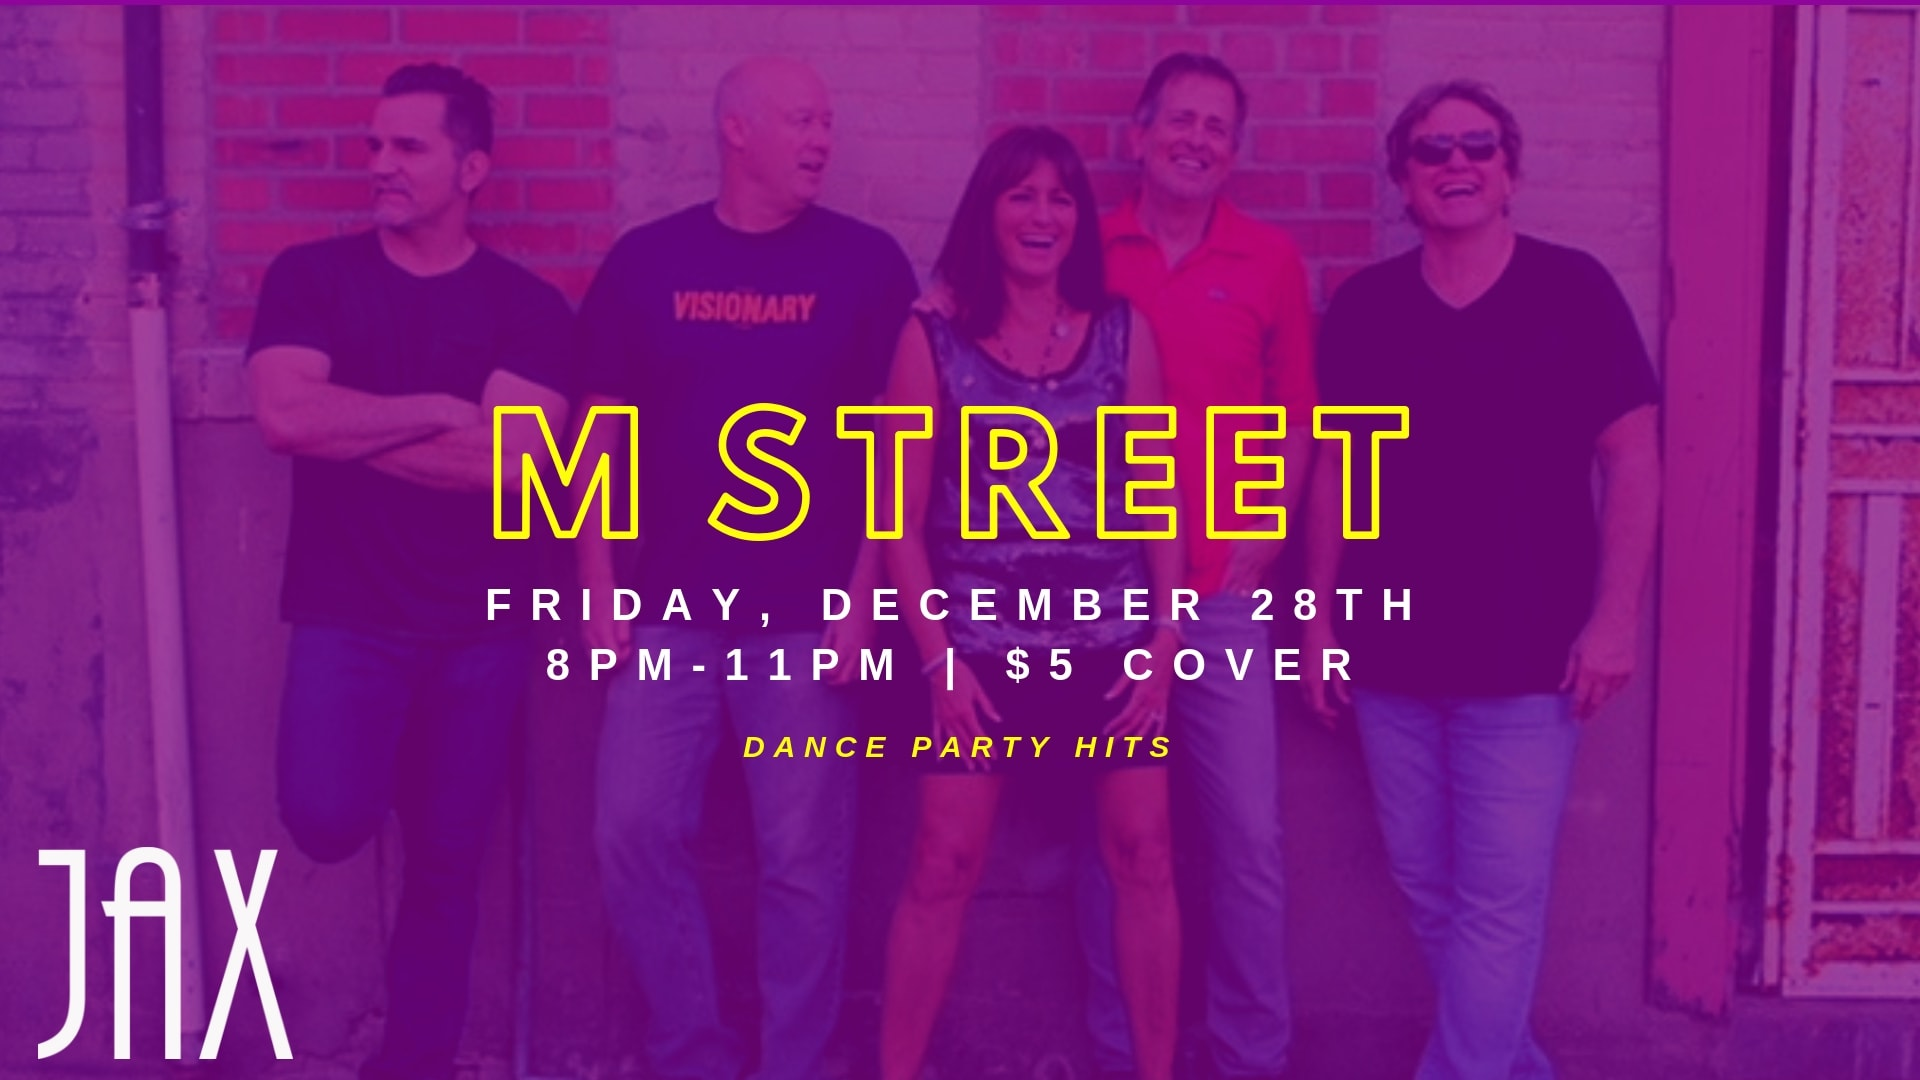 December 28 | M STREET